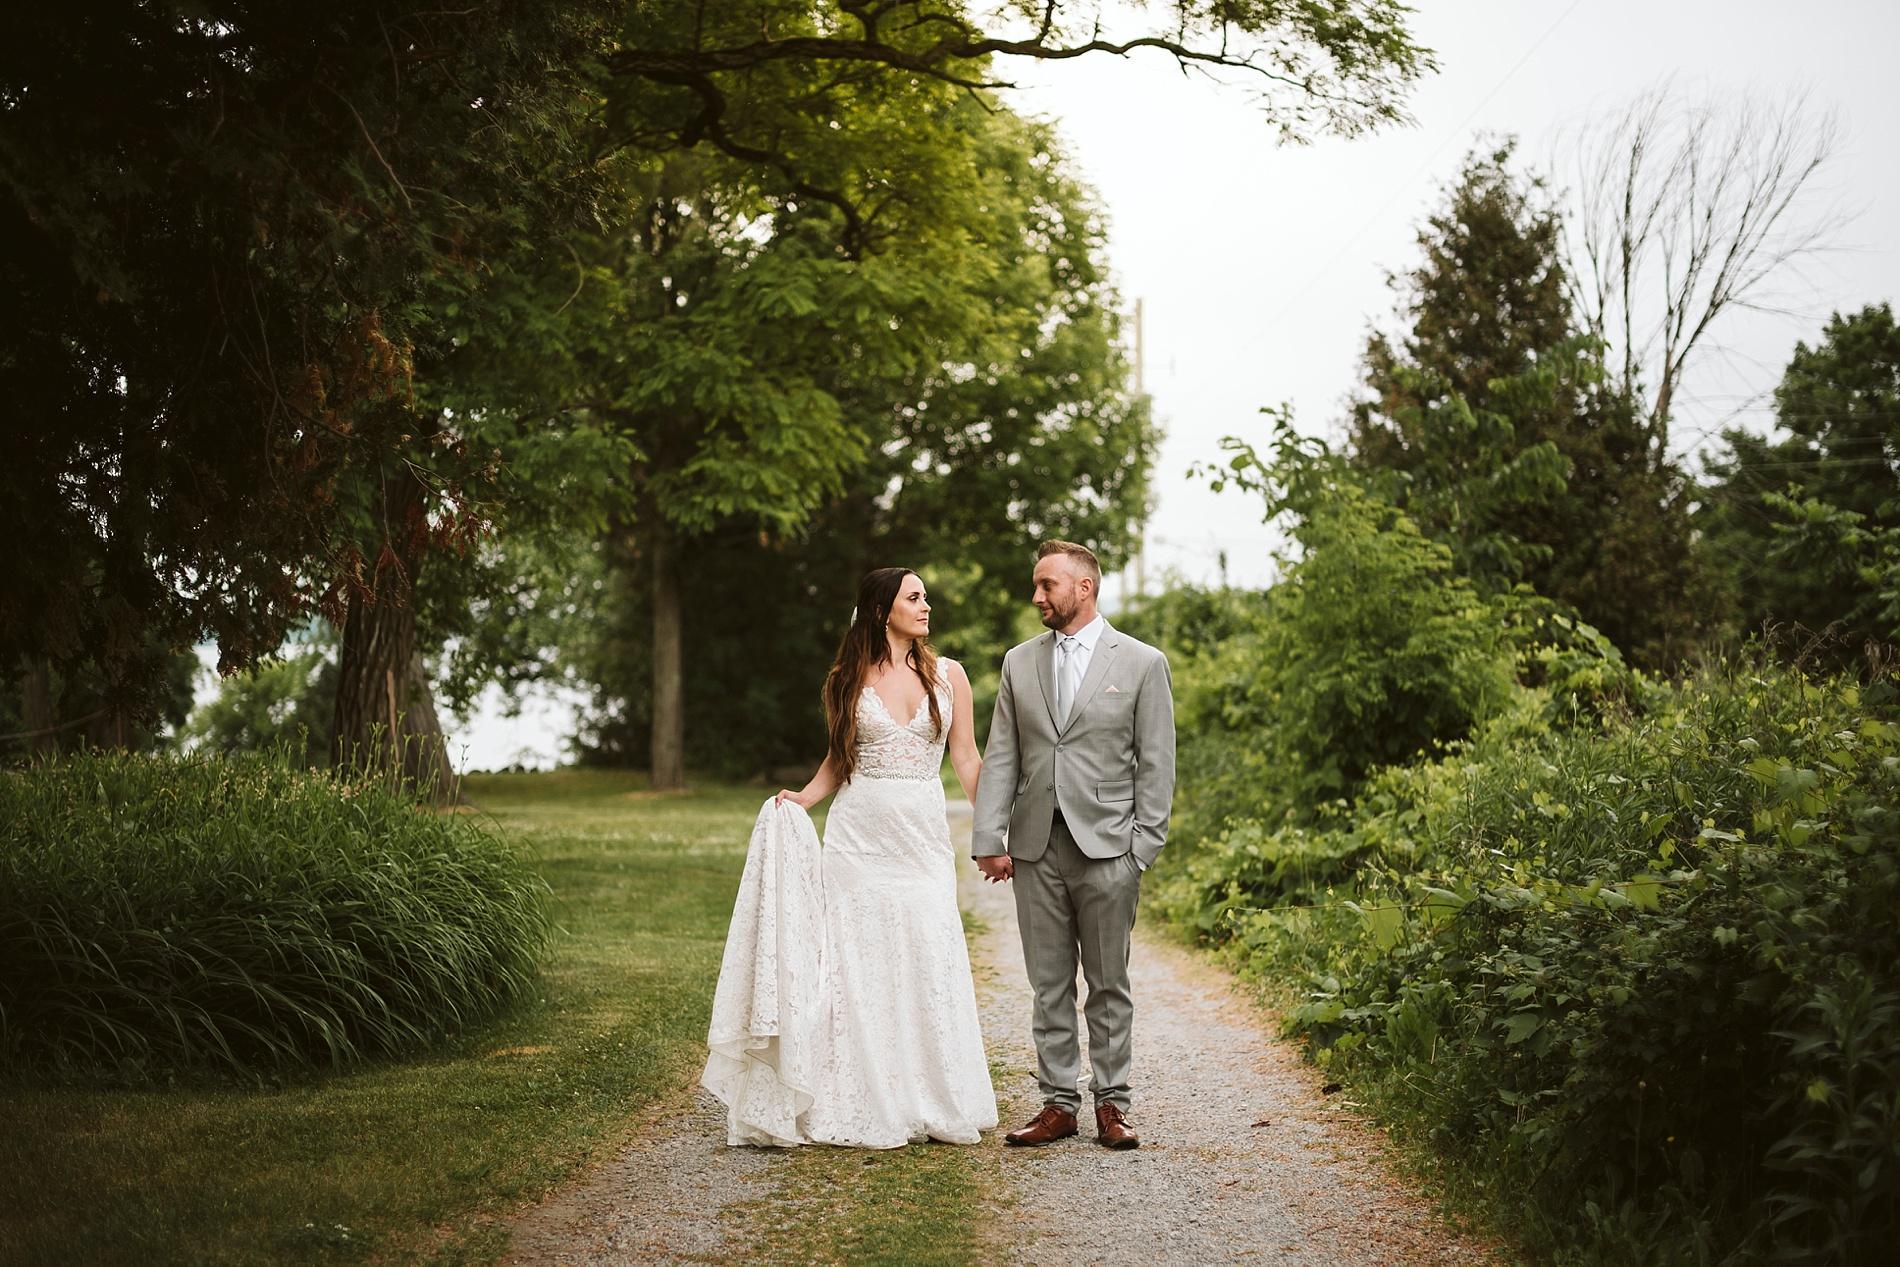 Kawartha_Lakes_Wedding_Bobcageon_Eganridge_Resort_Toronto_Photographer_0057.jpg